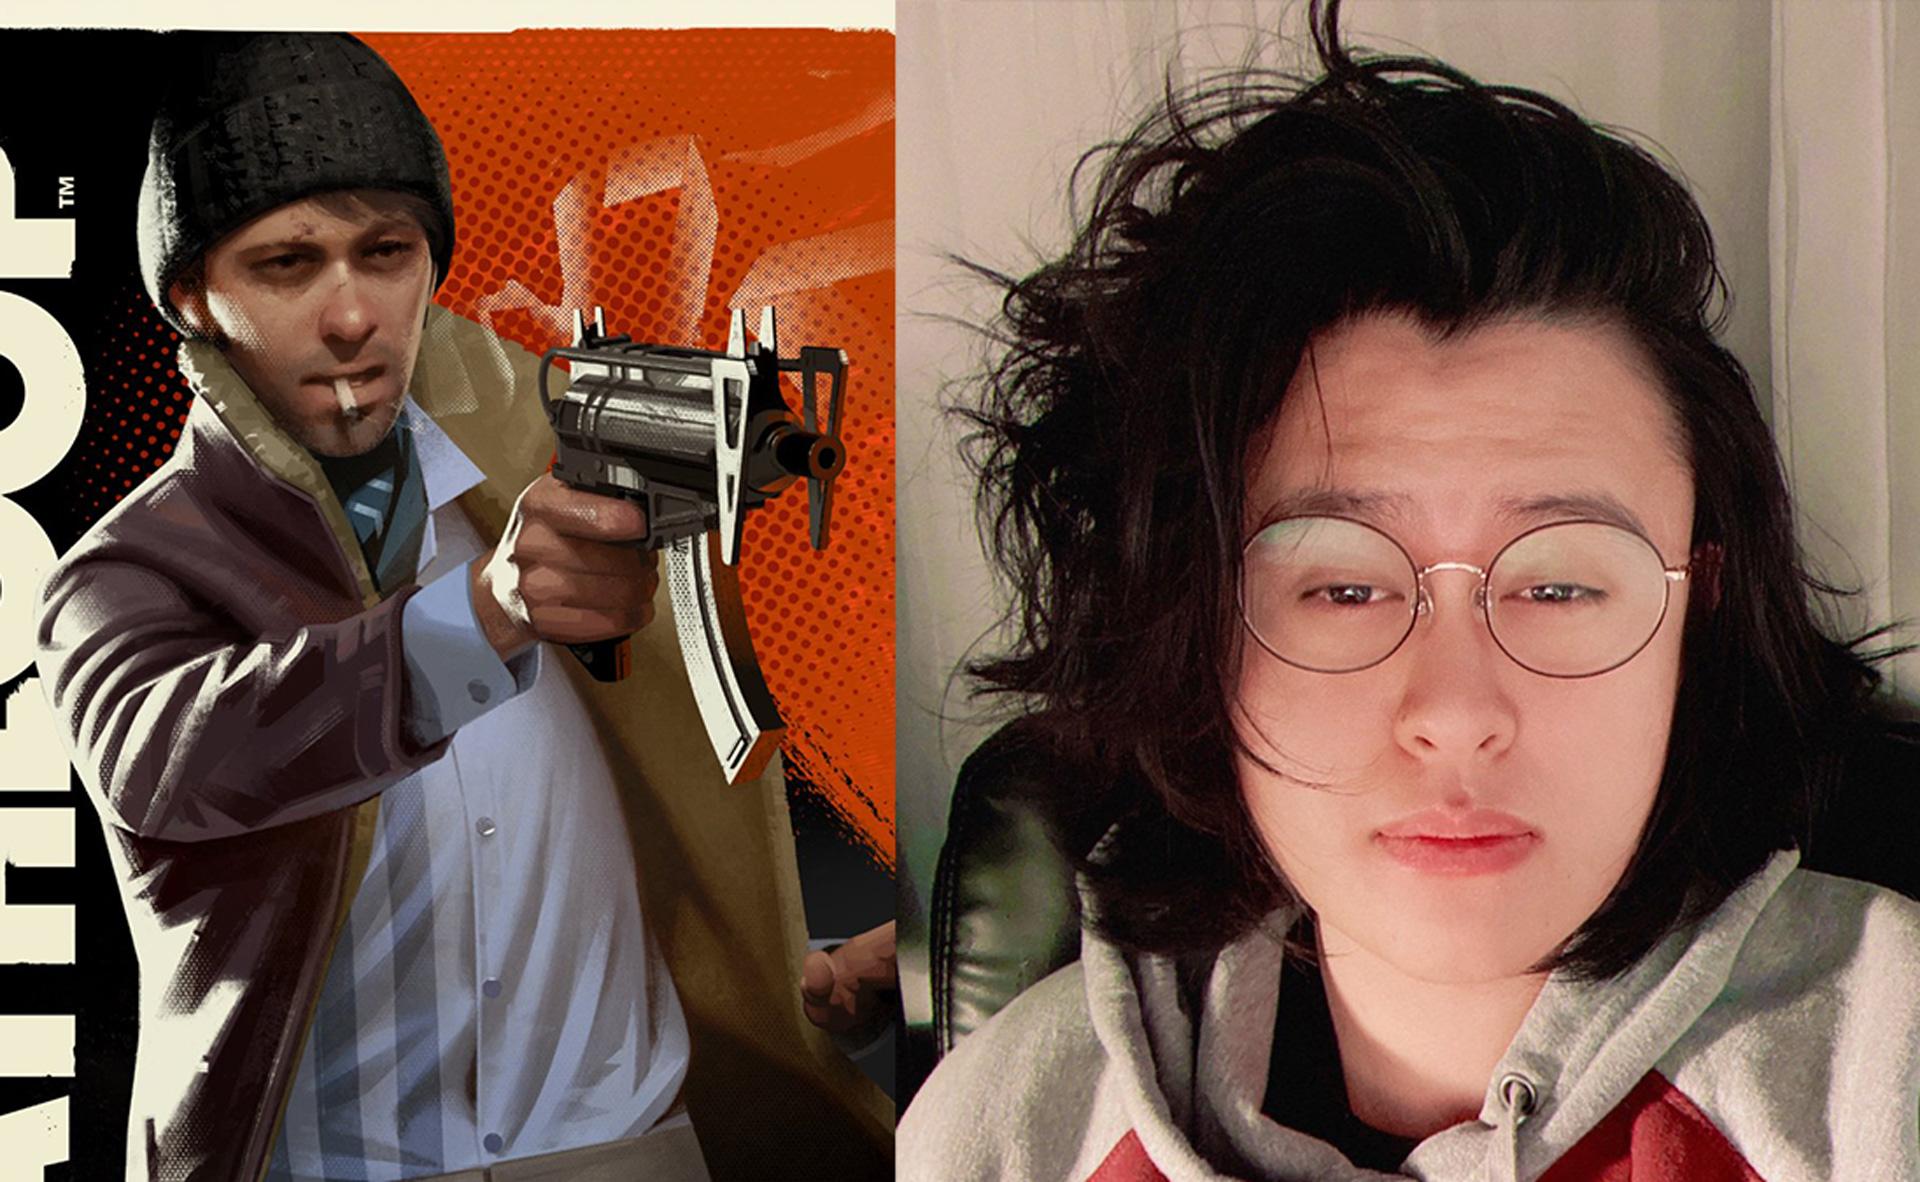 deathloop voice actor charlie montague Khoi Dao